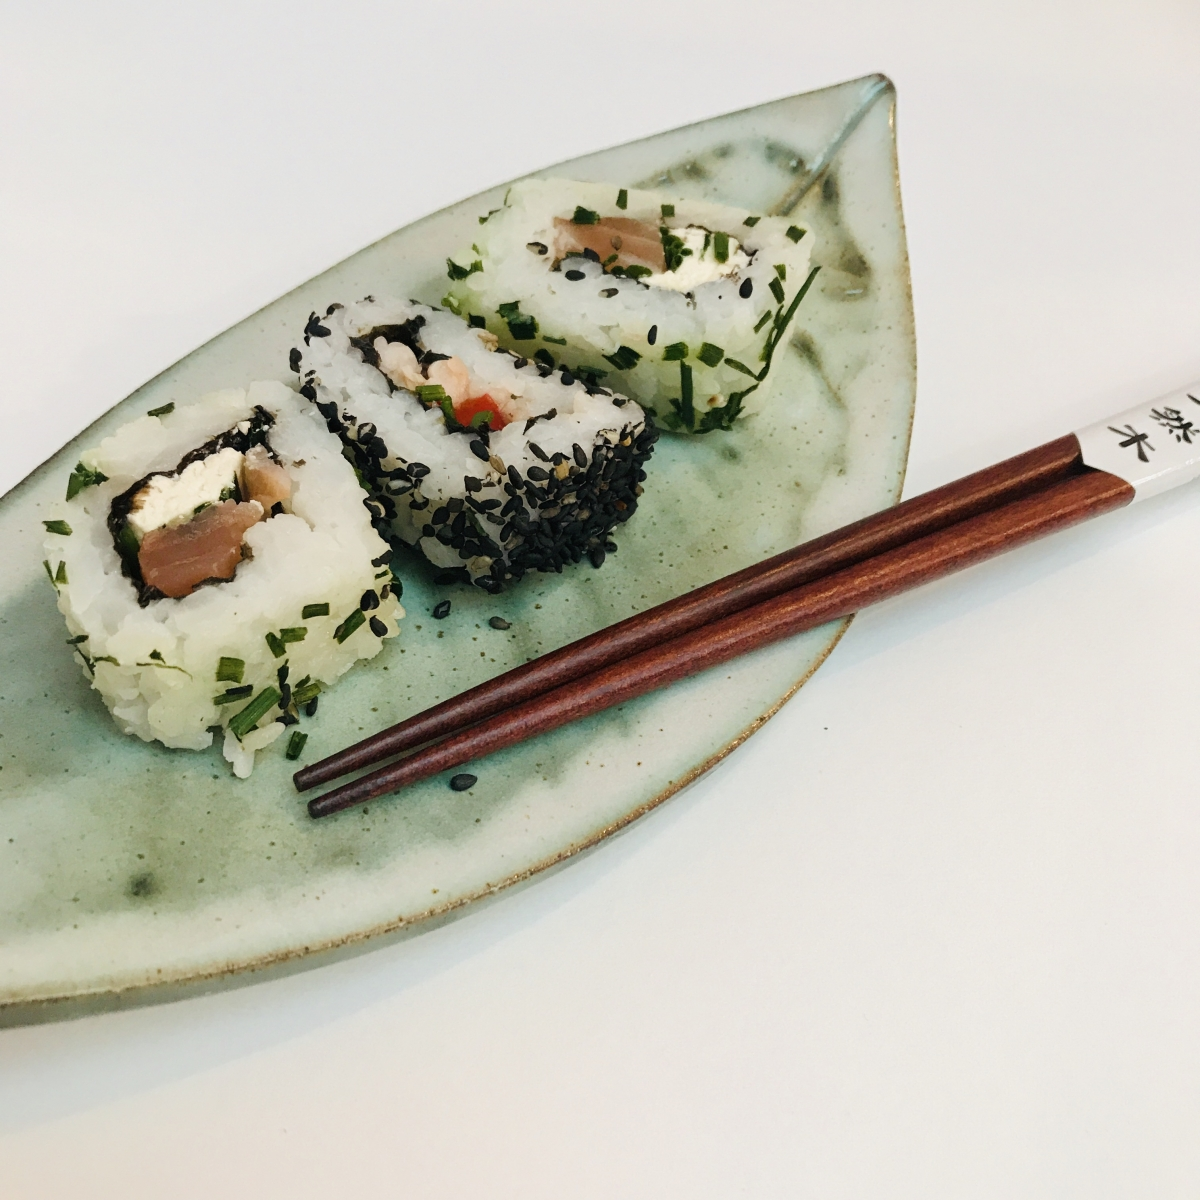 Leaf Sushi Dish with Chop Sticks and Sushi